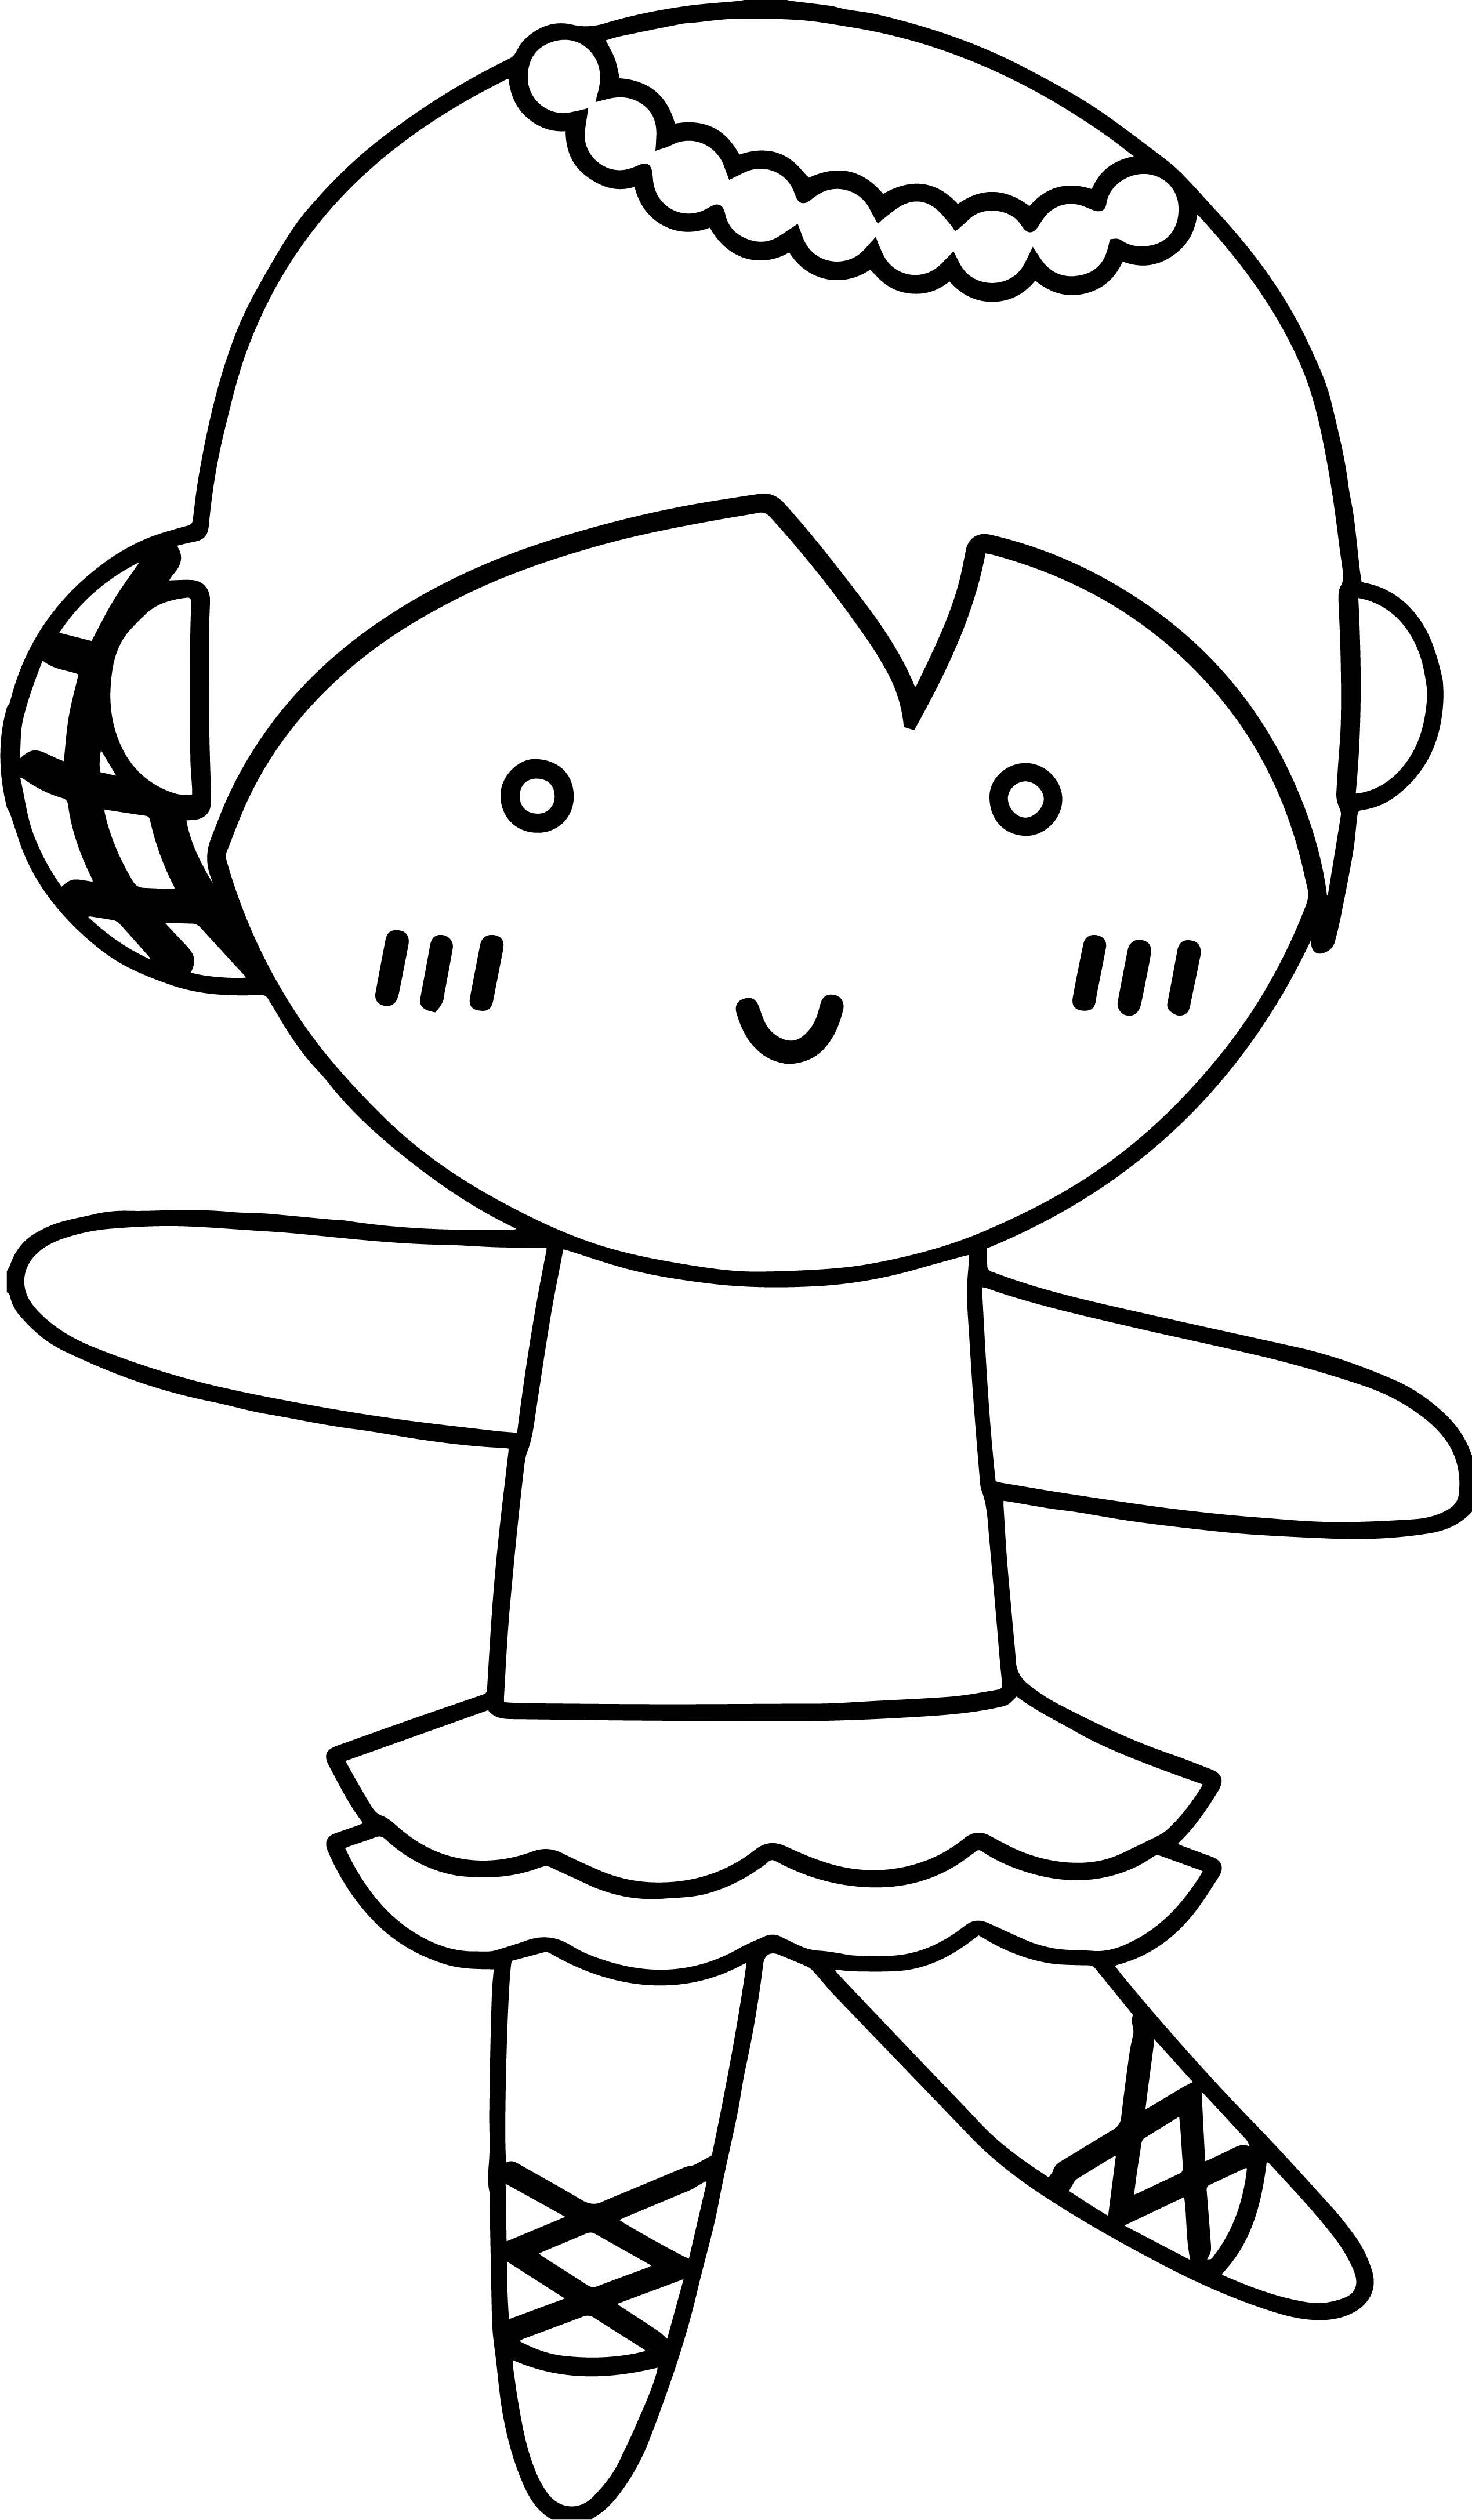 Ballerina Chibi Girl Coloring Page